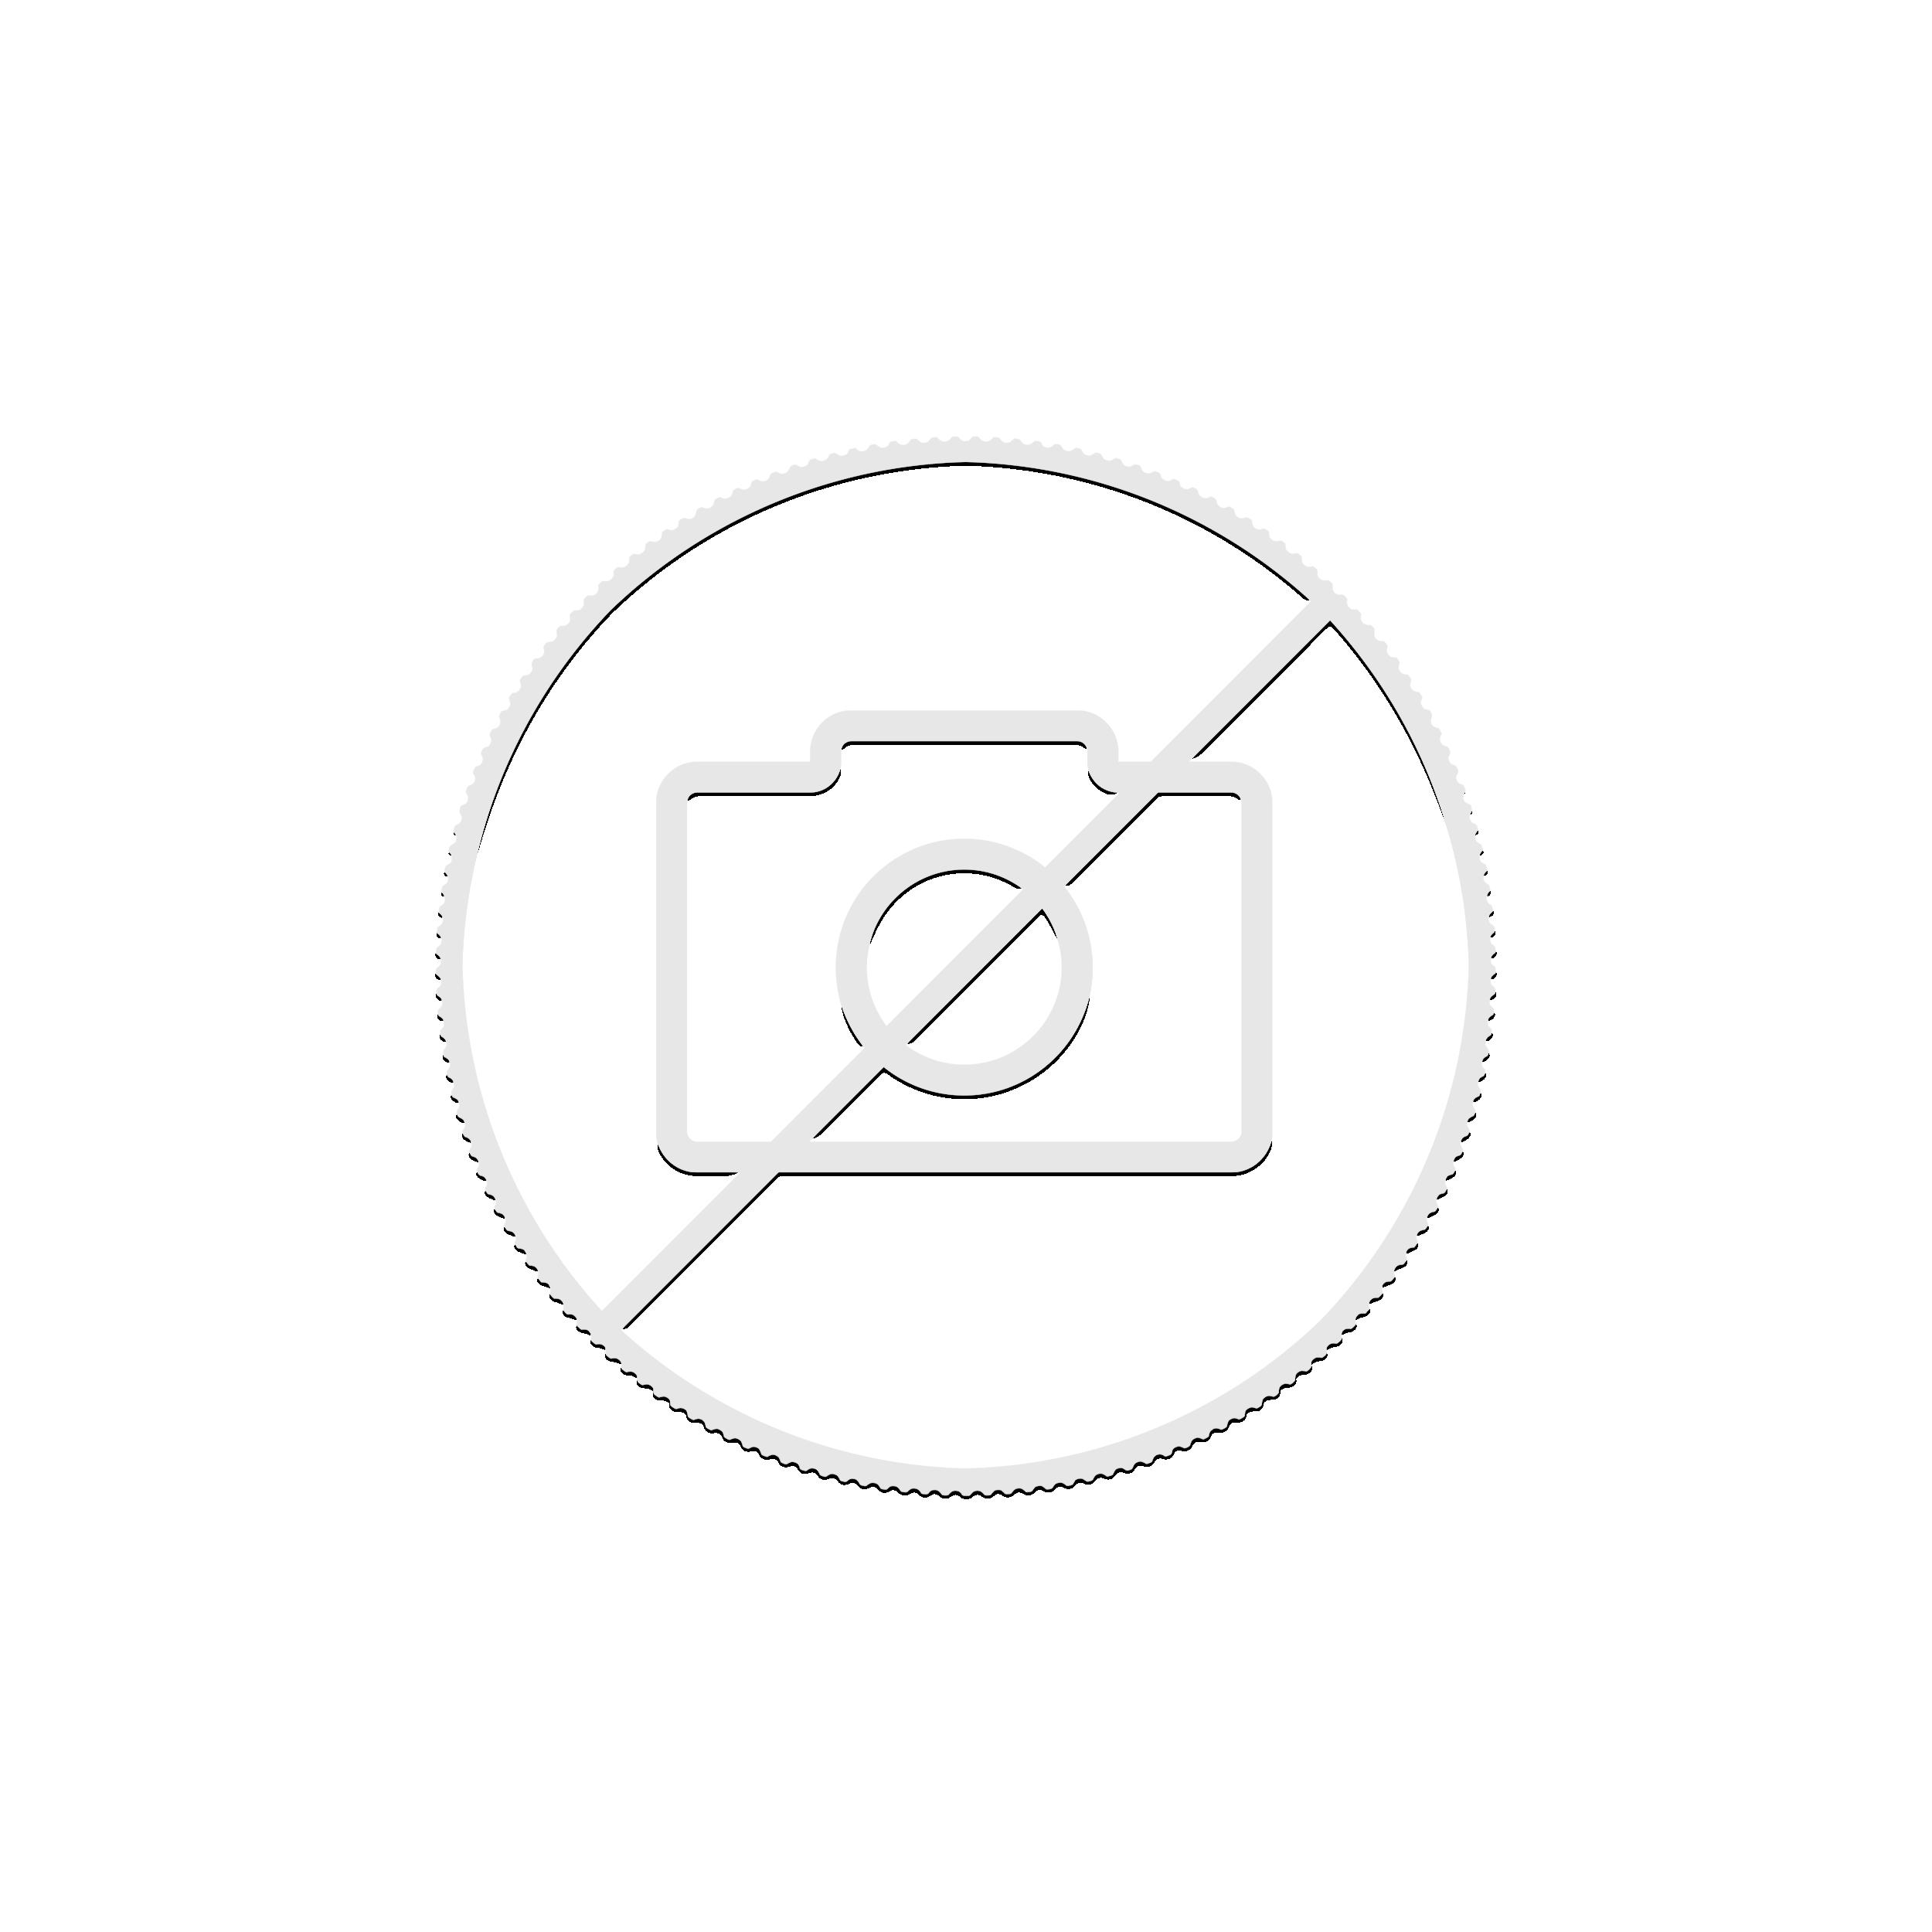 Gouden 1/10 troy ounce American Eagle munt 2020